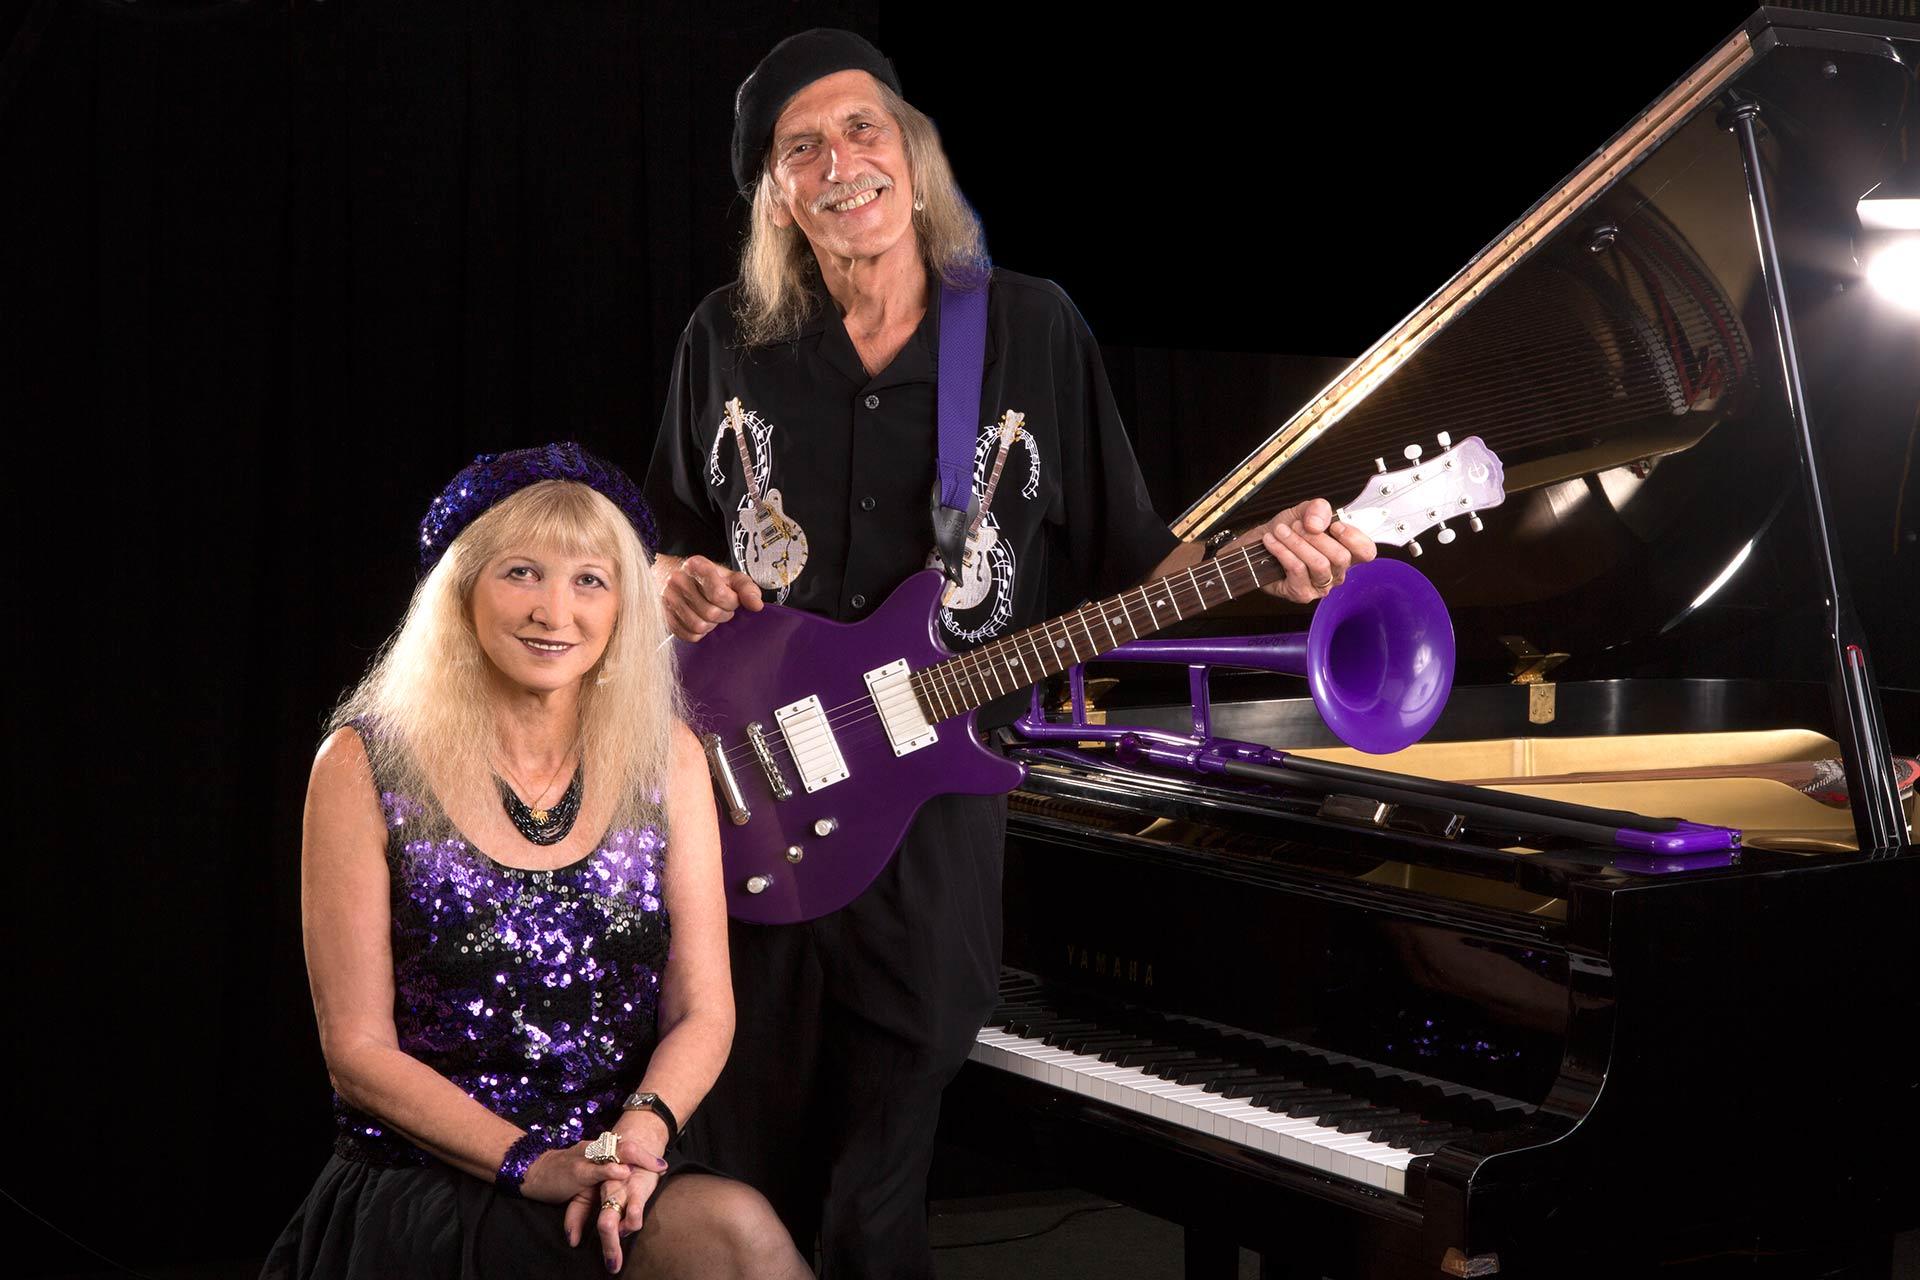 Liz Pennock & Dr. Blues